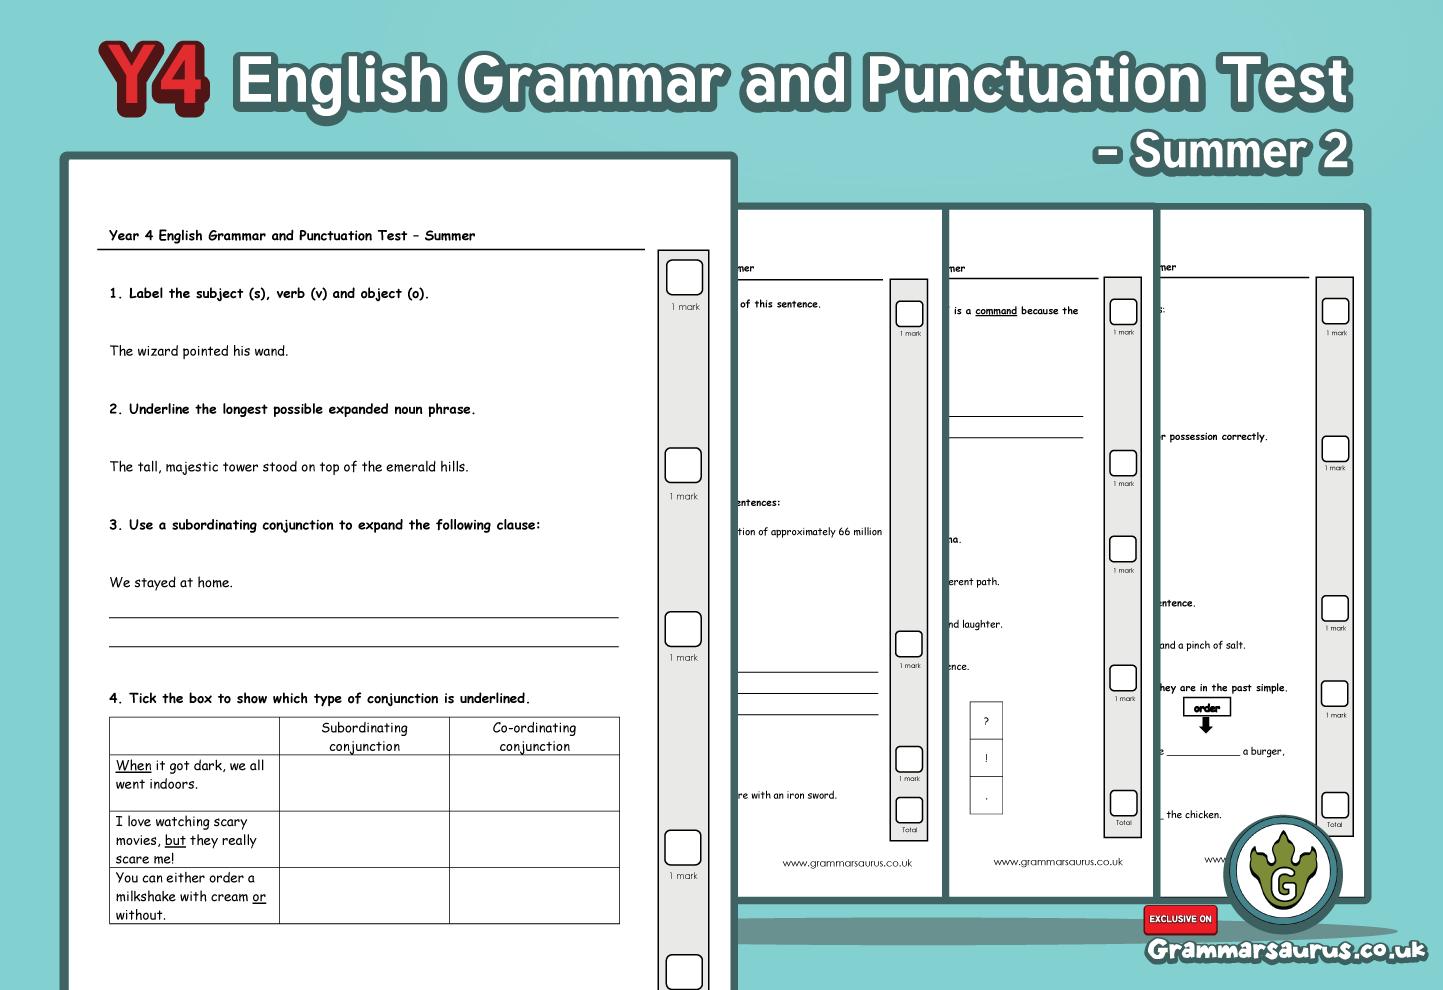 Ks2 Archives Page 16 Of 17 Grammarsaurus Circuit Diagram Year 4 English Spelling Punctuation And Grammar Progress Test Summer 2